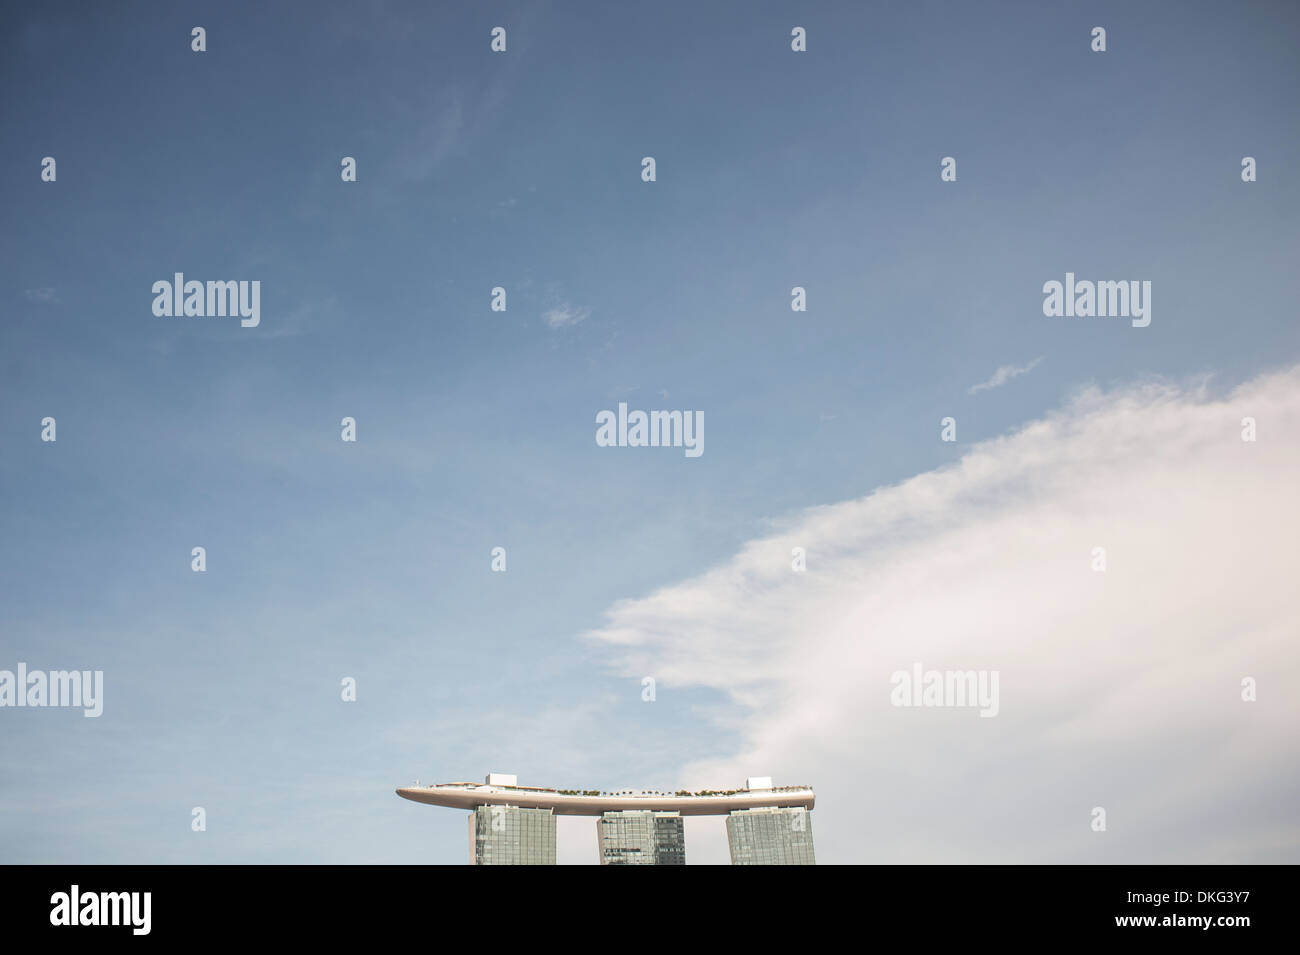 Marina Bay Sands - Stock Image